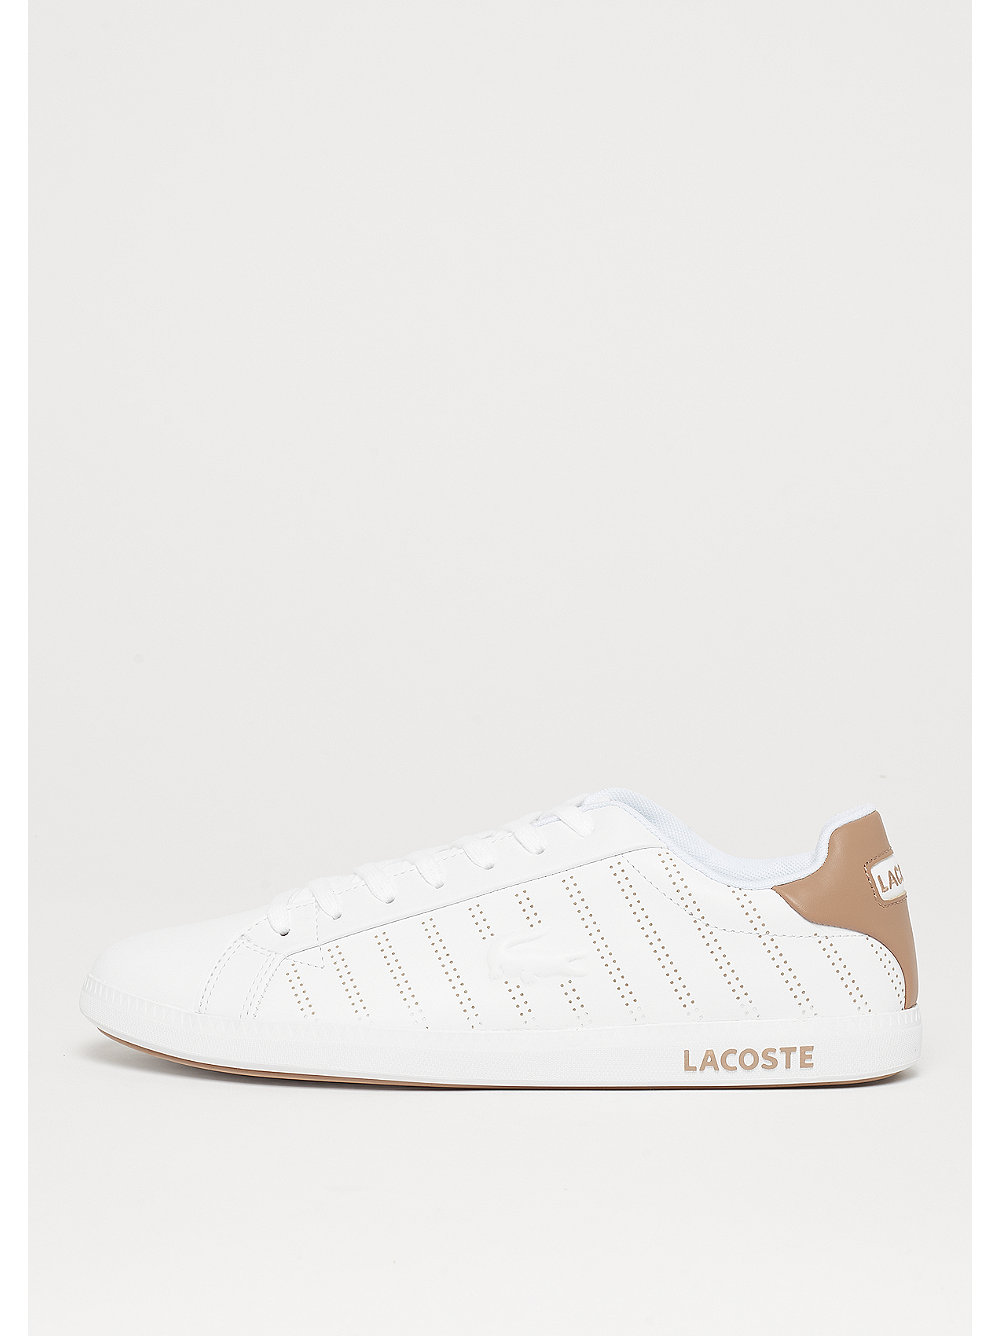 Lacoste Graduate 318 1SPM white/lt tan